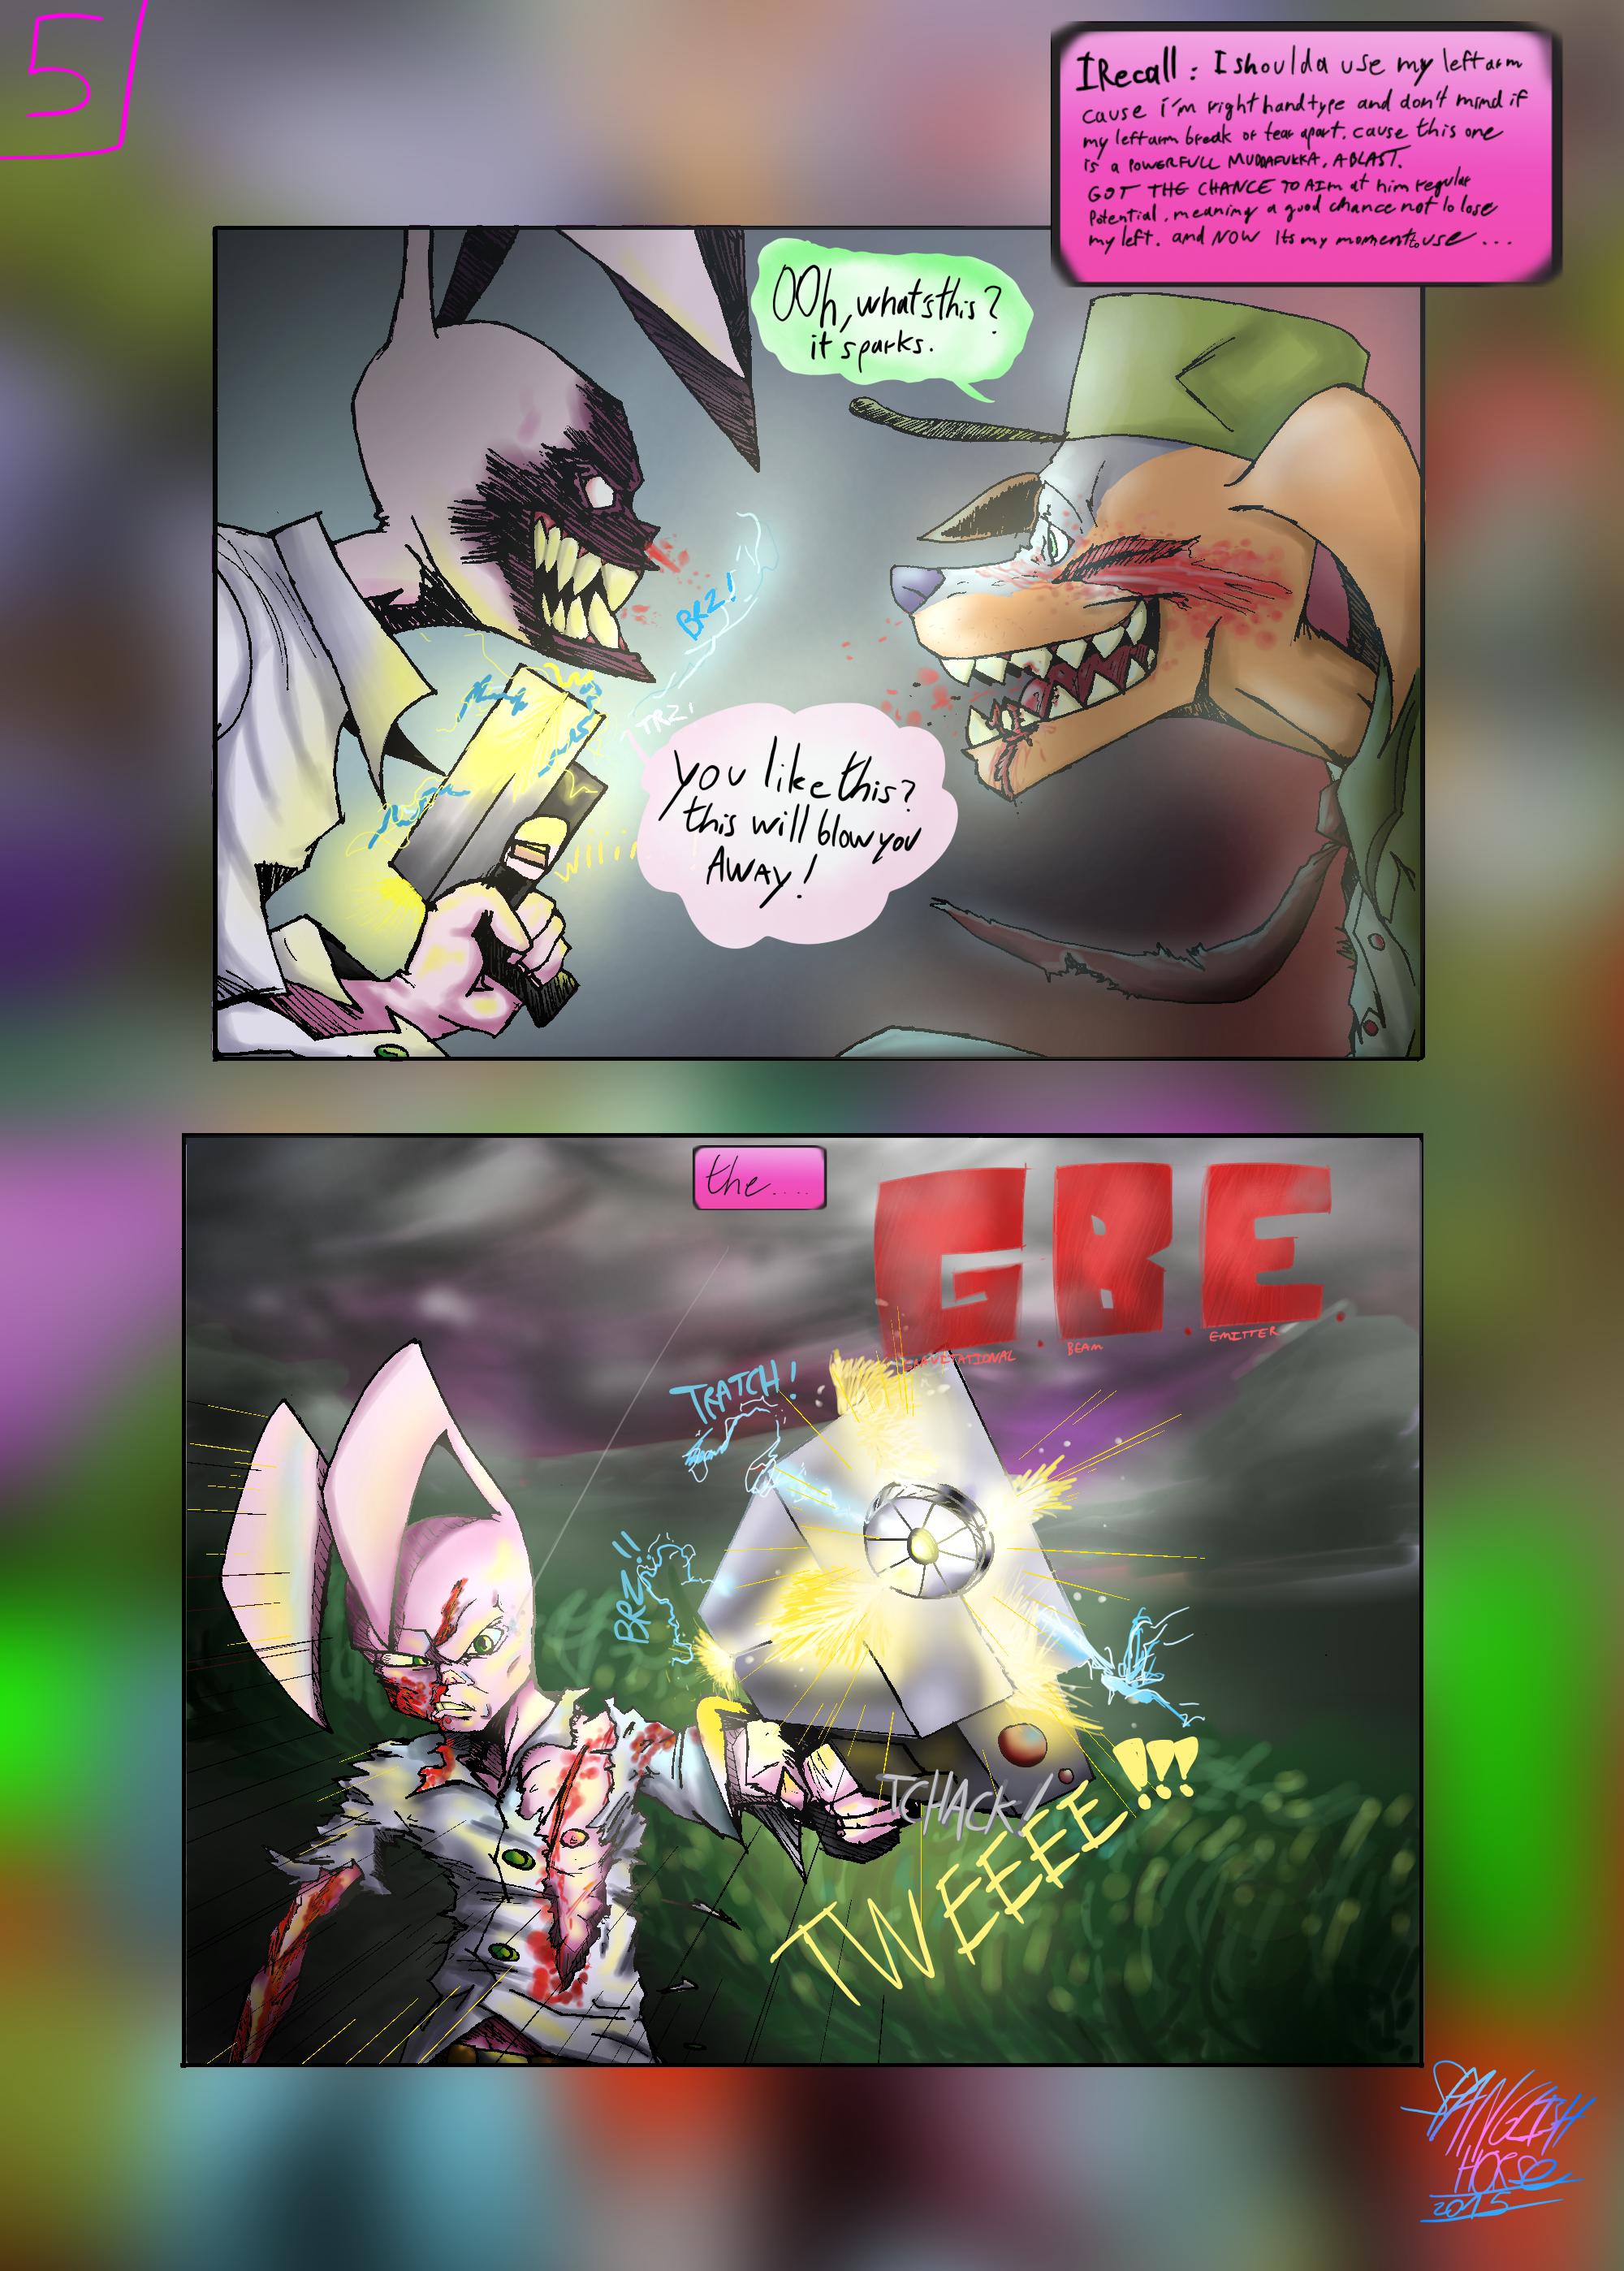 Bob the Psycho Rabbit Vs Alfred Alfer Page 5 (comic) (5/39)